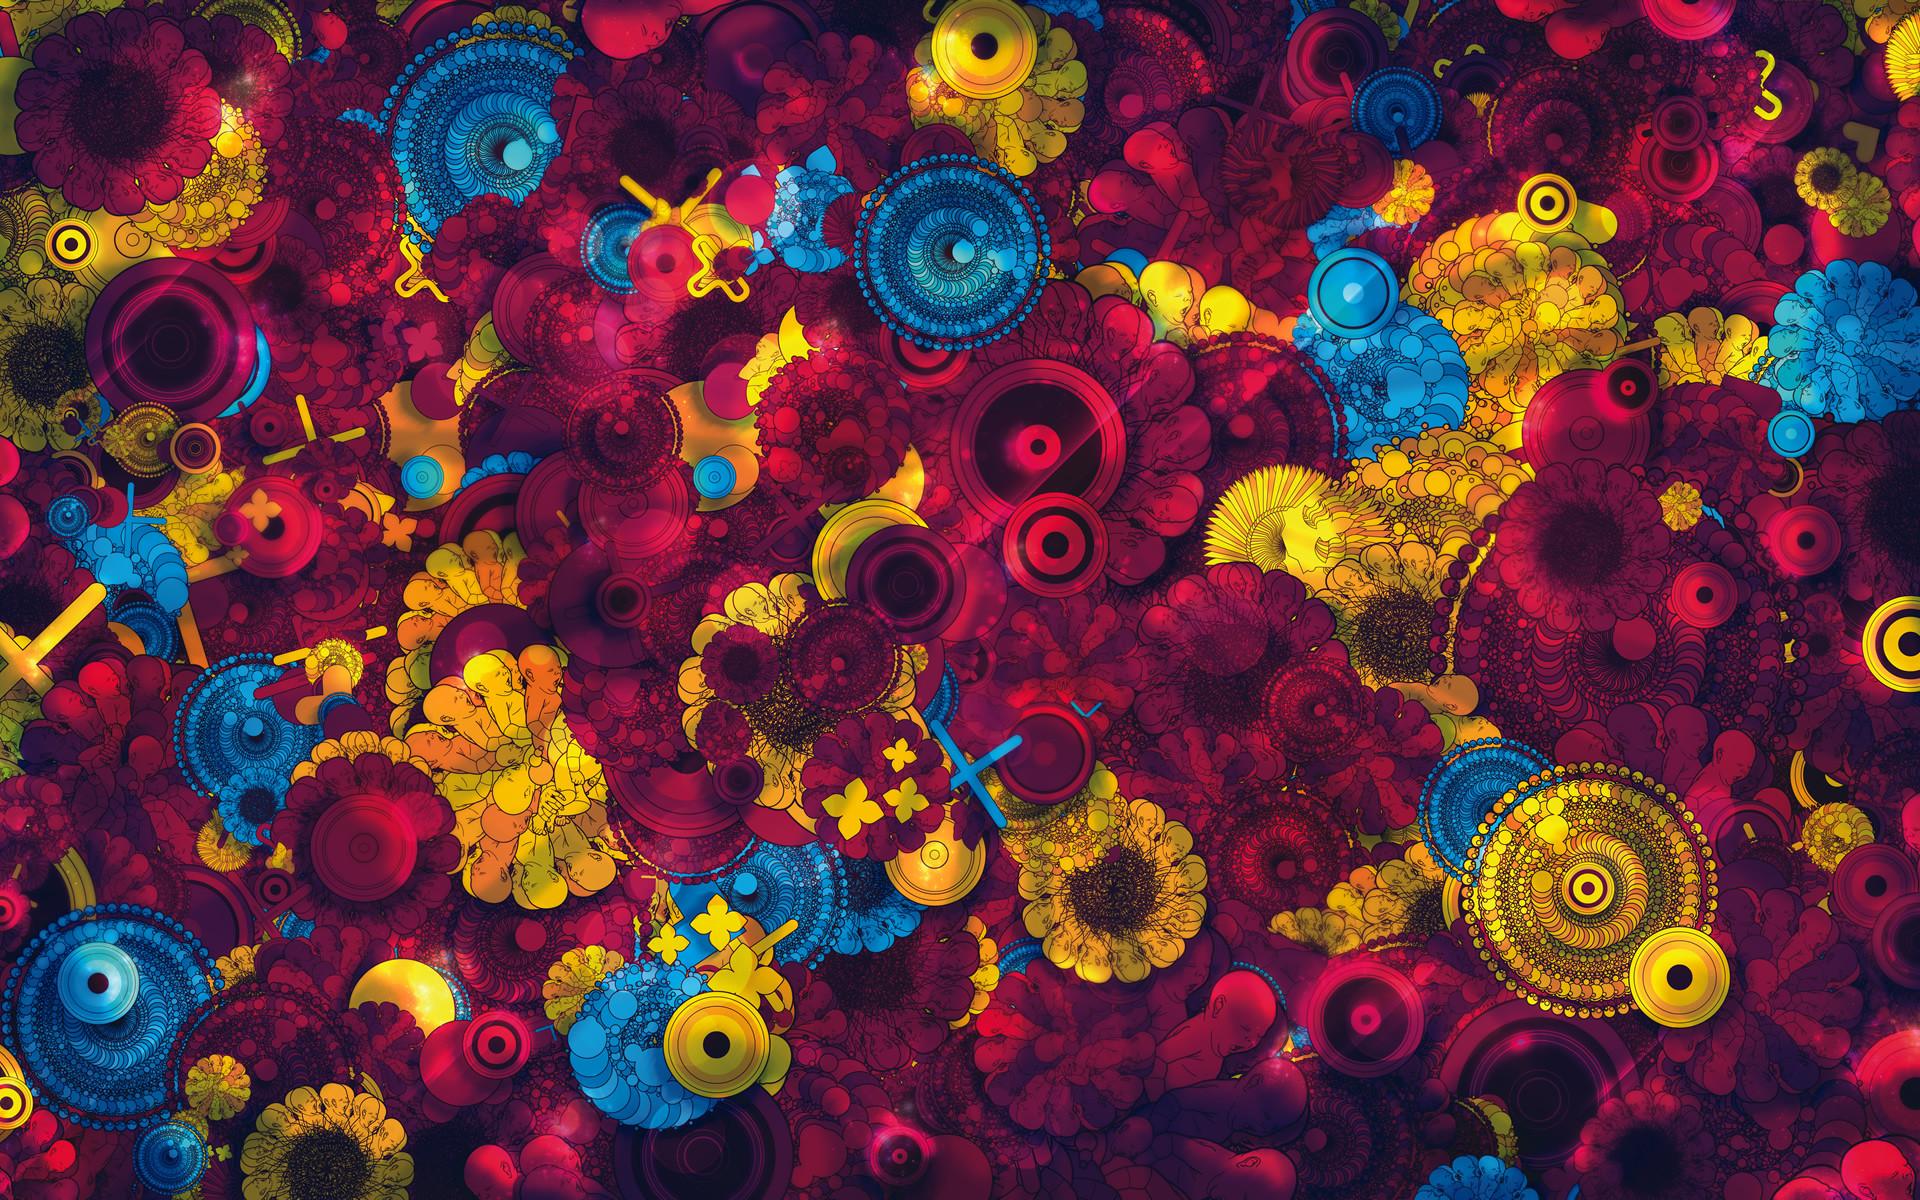 Art colorful Creative Design psychedelic HD Wallpaper